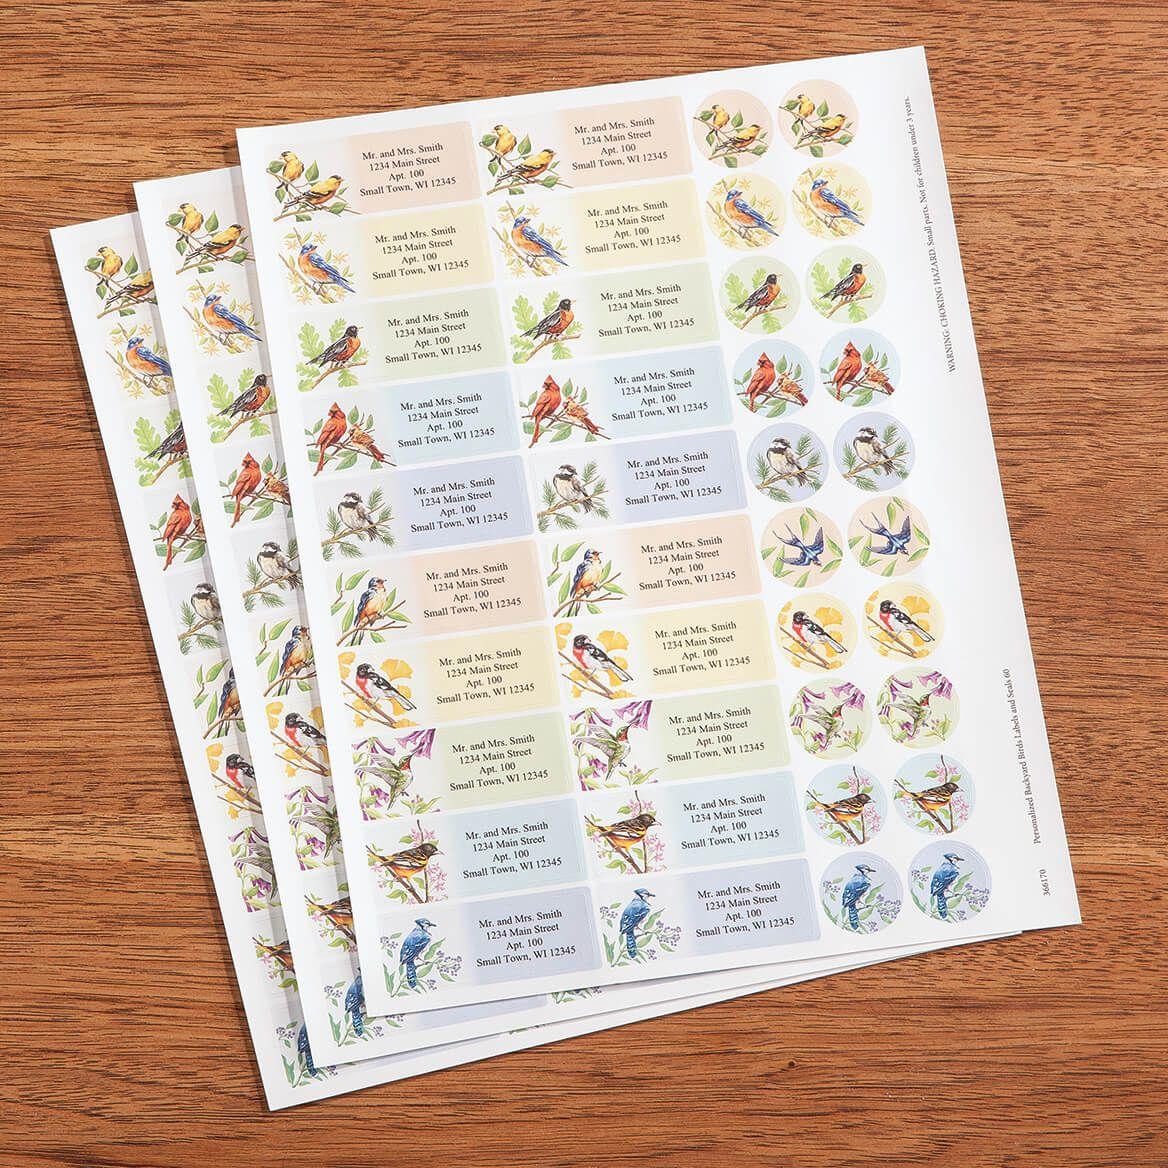 Personalized Backyard Birds Labels & Envelope Seals, Set of 60-366170